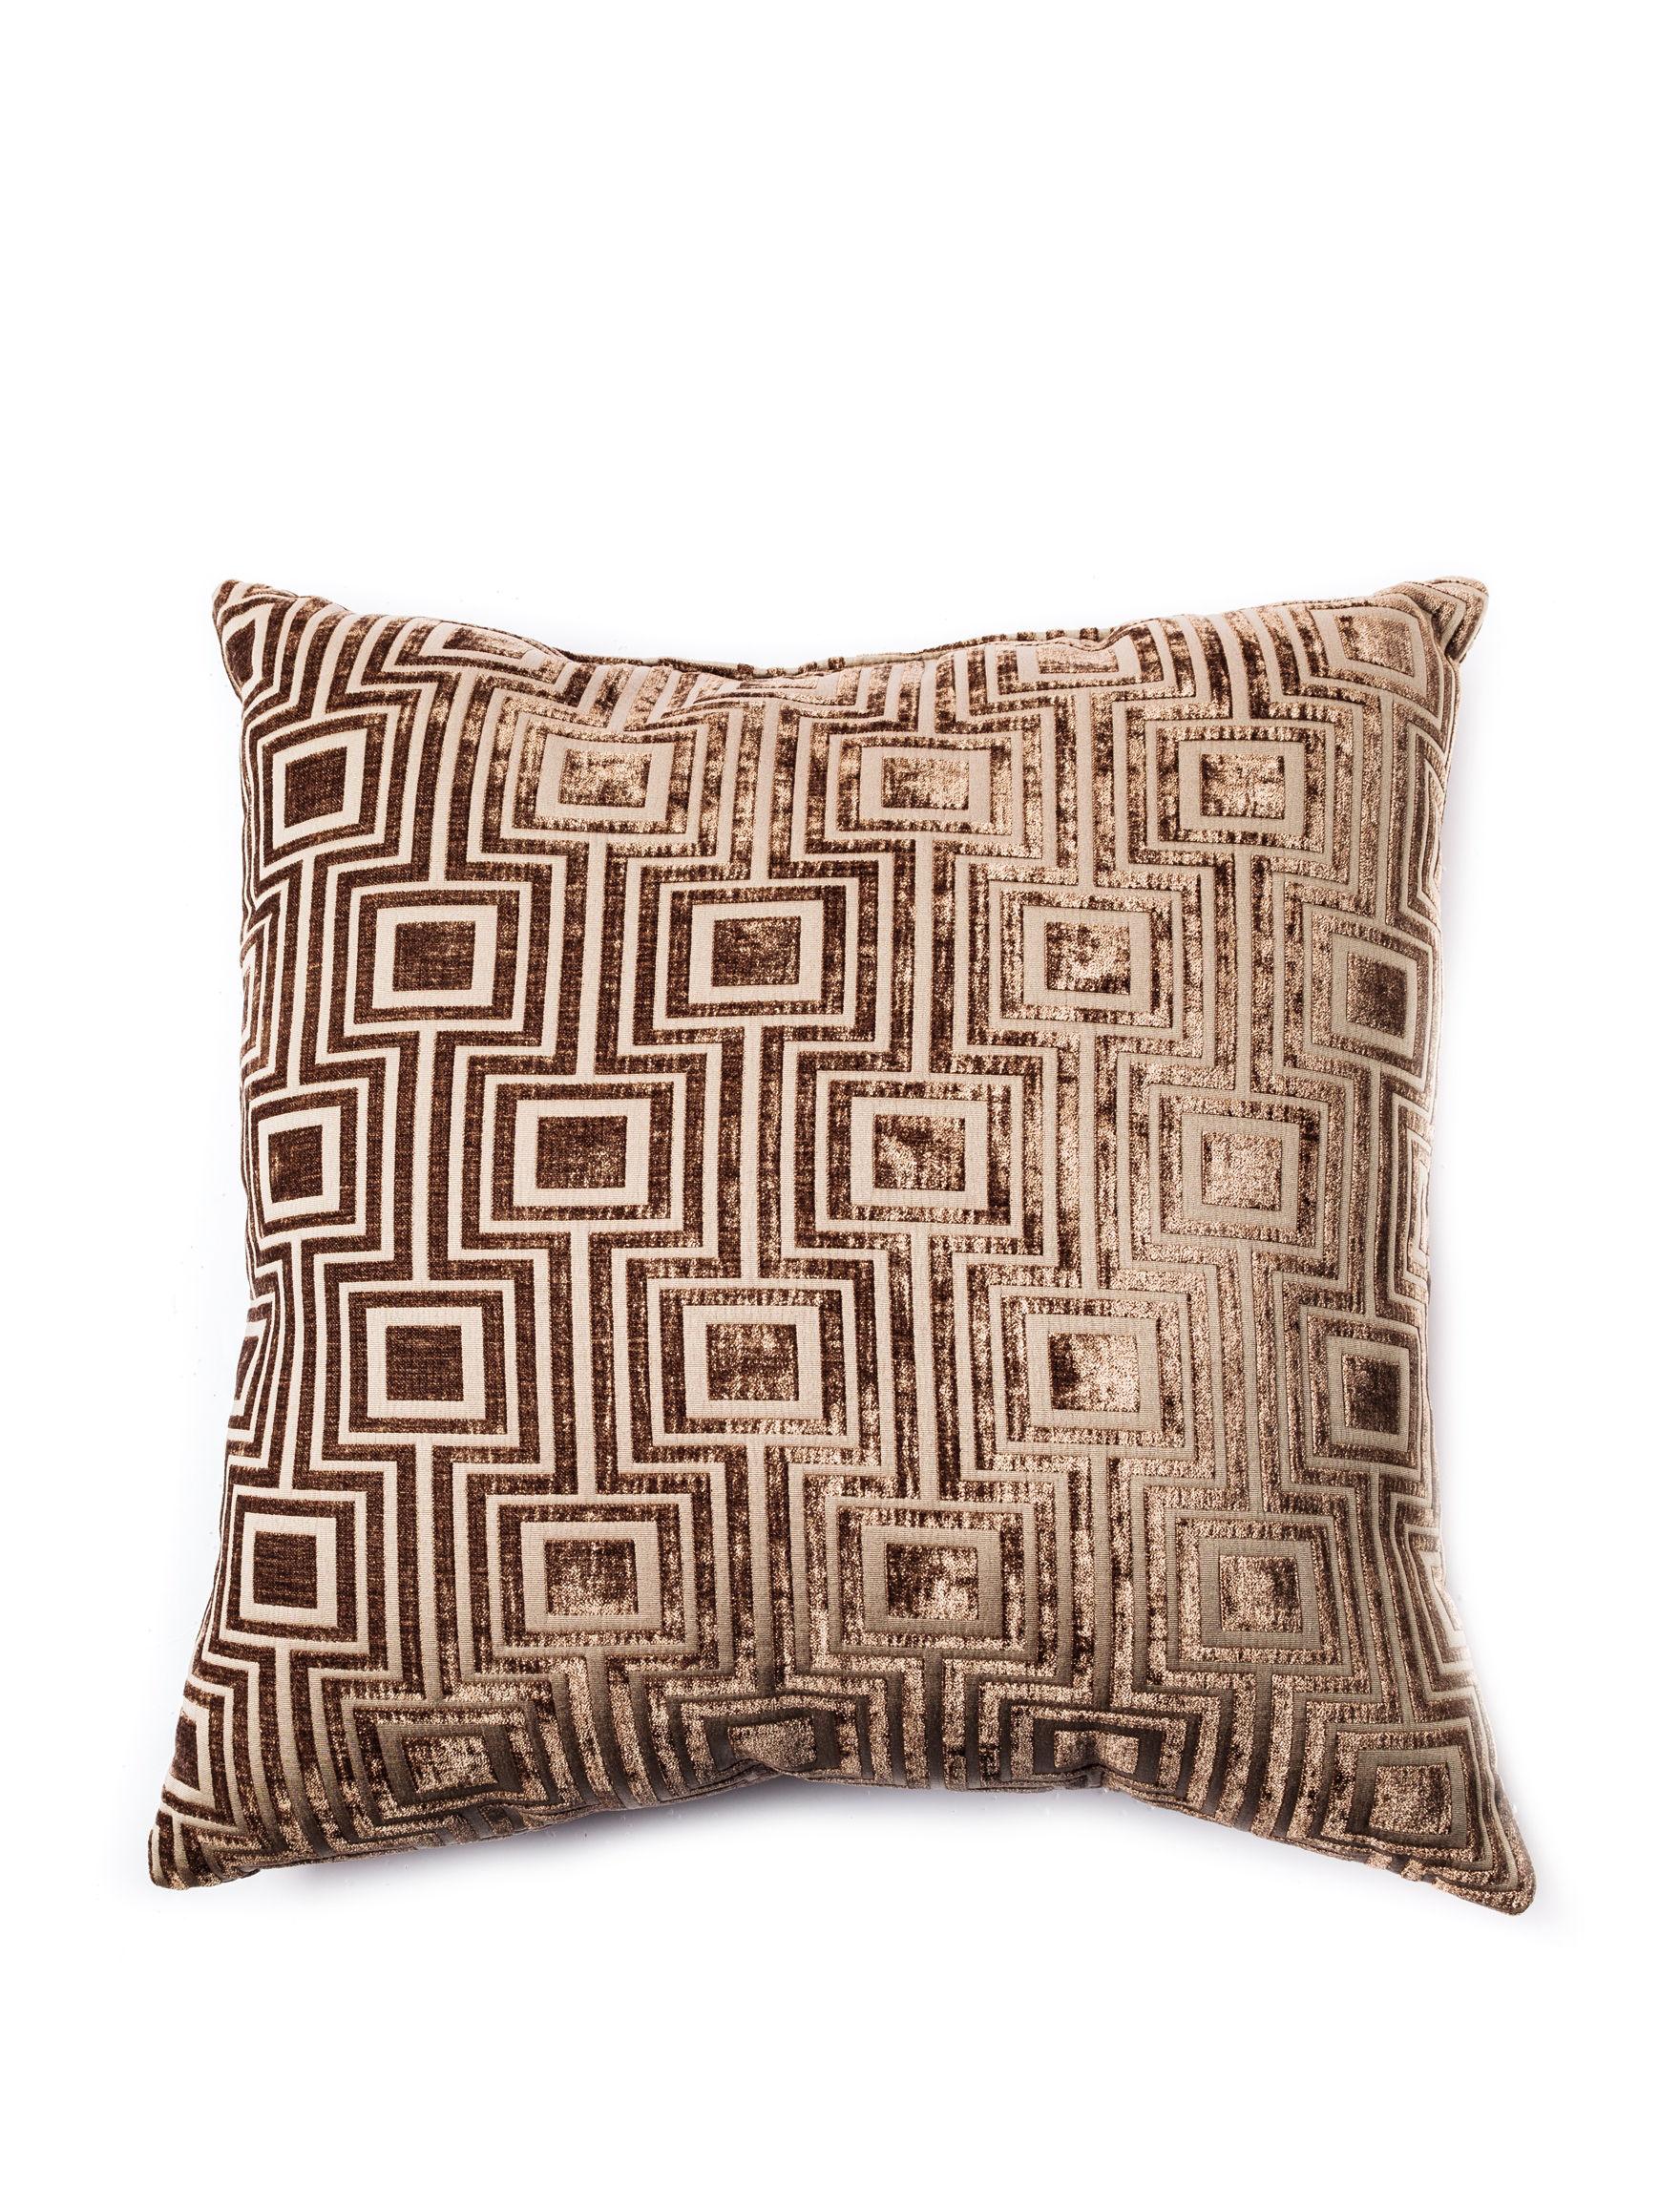 Home Fashions International Sage Decorative Pillows